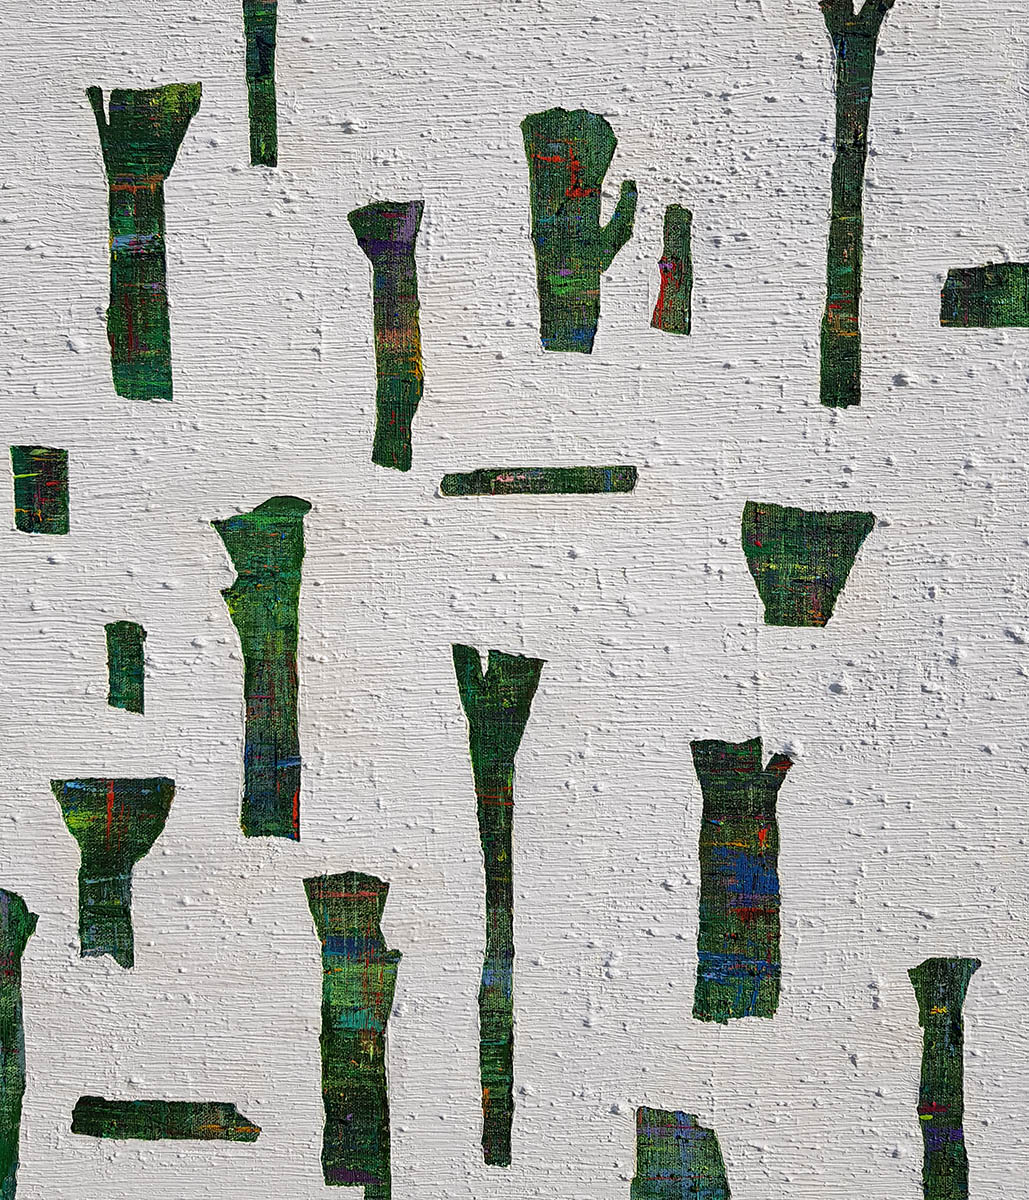 Dreaming Tree︱53.0x46.0cm, Acrylic on Canvas︱2018